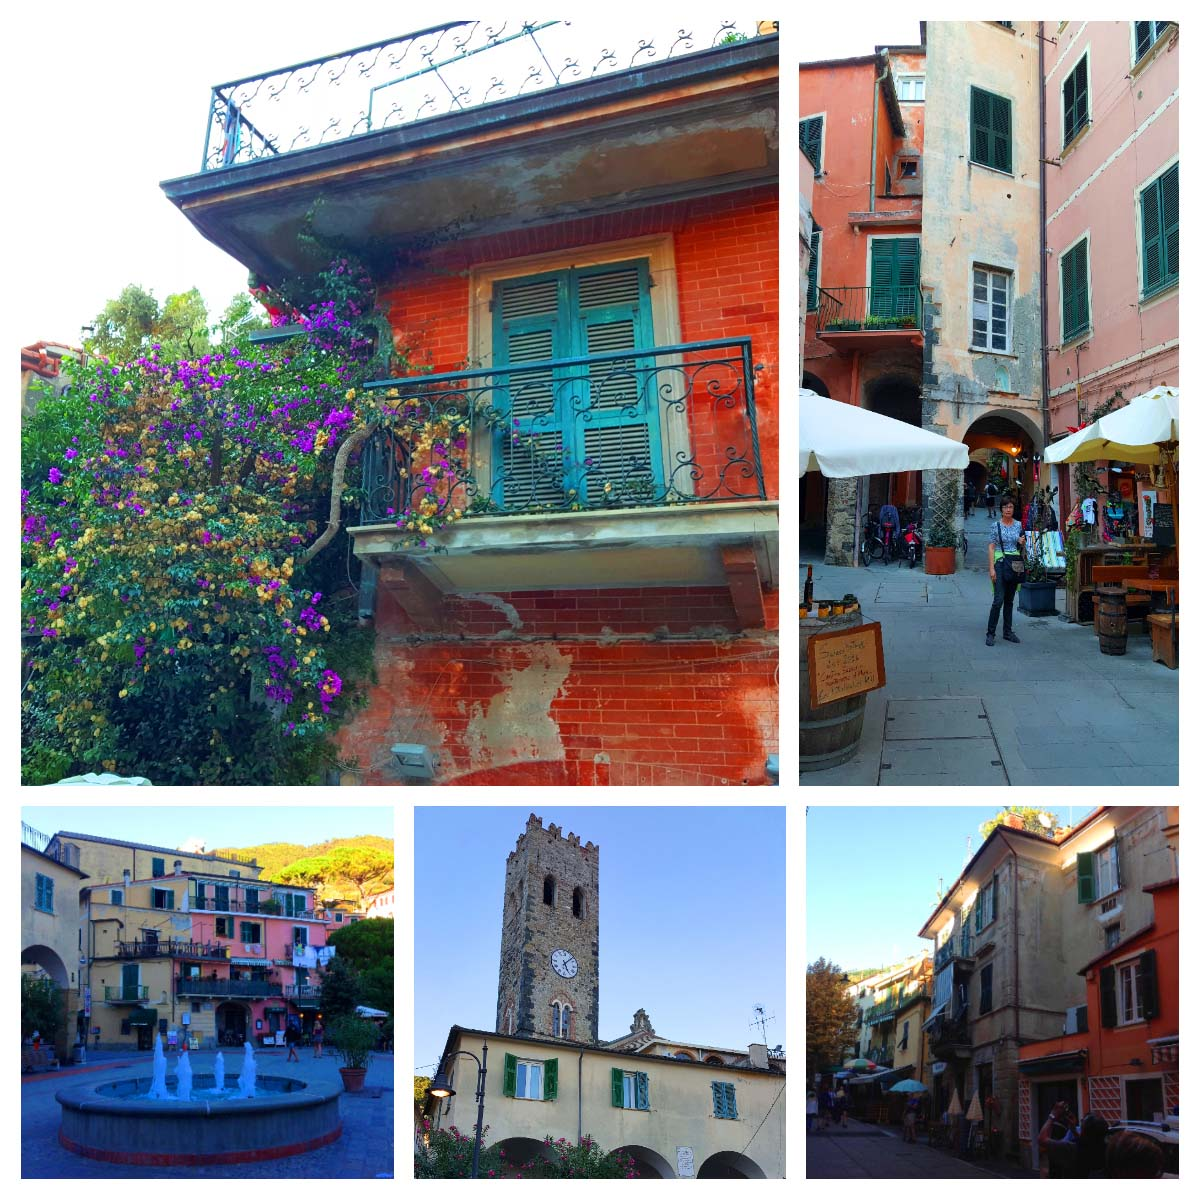 Centro histórico de Monterosso Al Mare, Cinque Terre